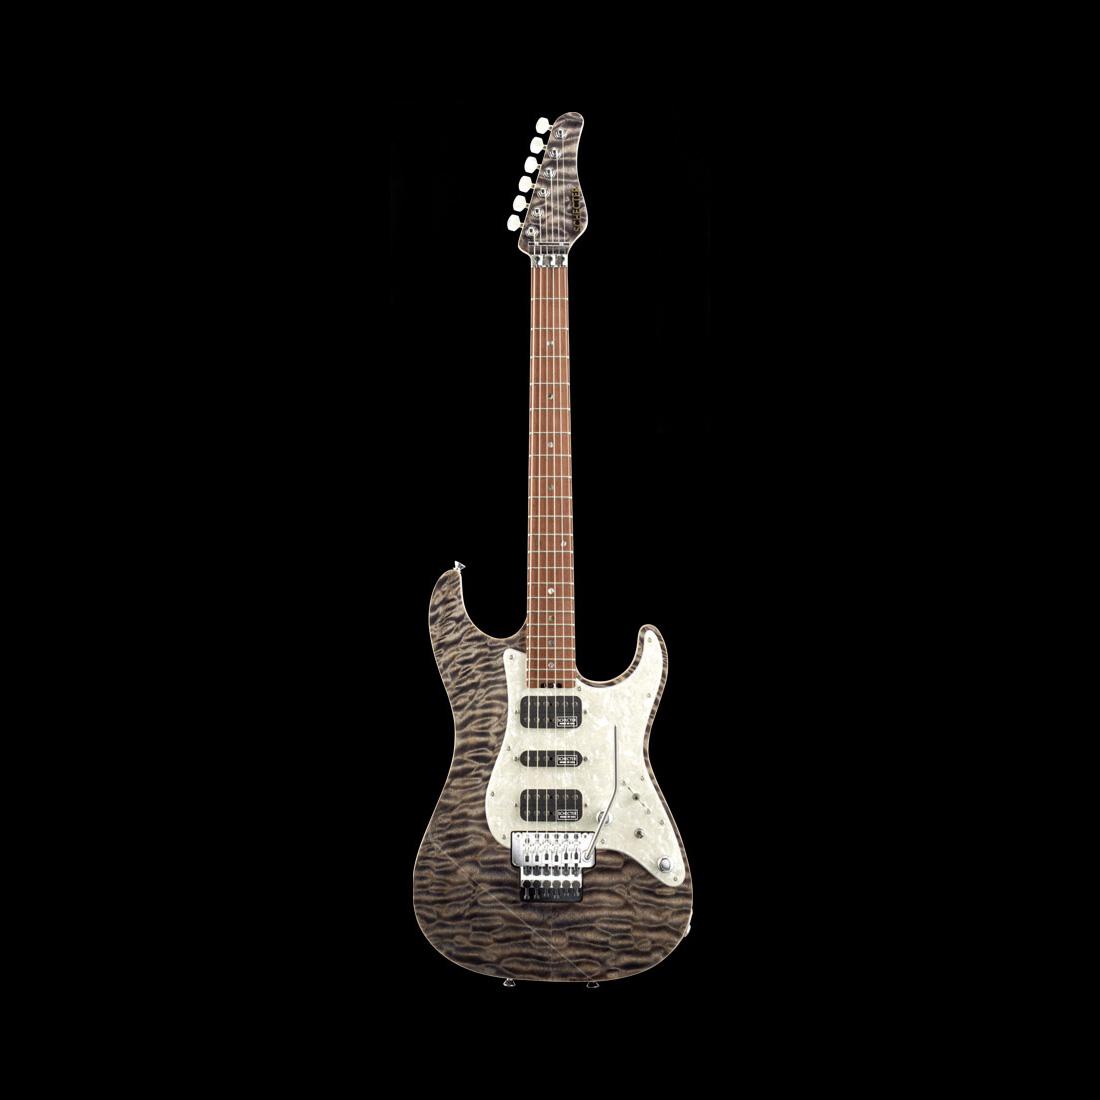 Schecter / EX-V-22-CTM-FRT R 5A Black Natural シェクター エレキギター 《完全受注生産:予約受付中》